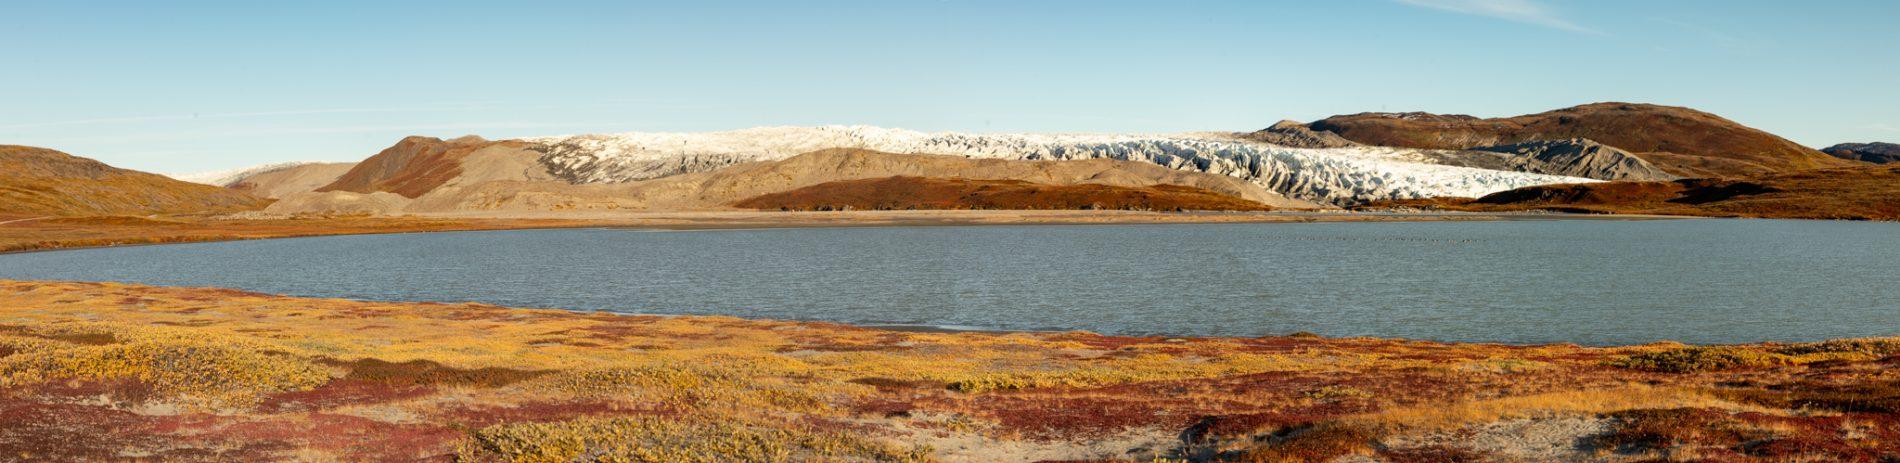 Am Russell Glacier bei Kangerlussuaq, Grönland